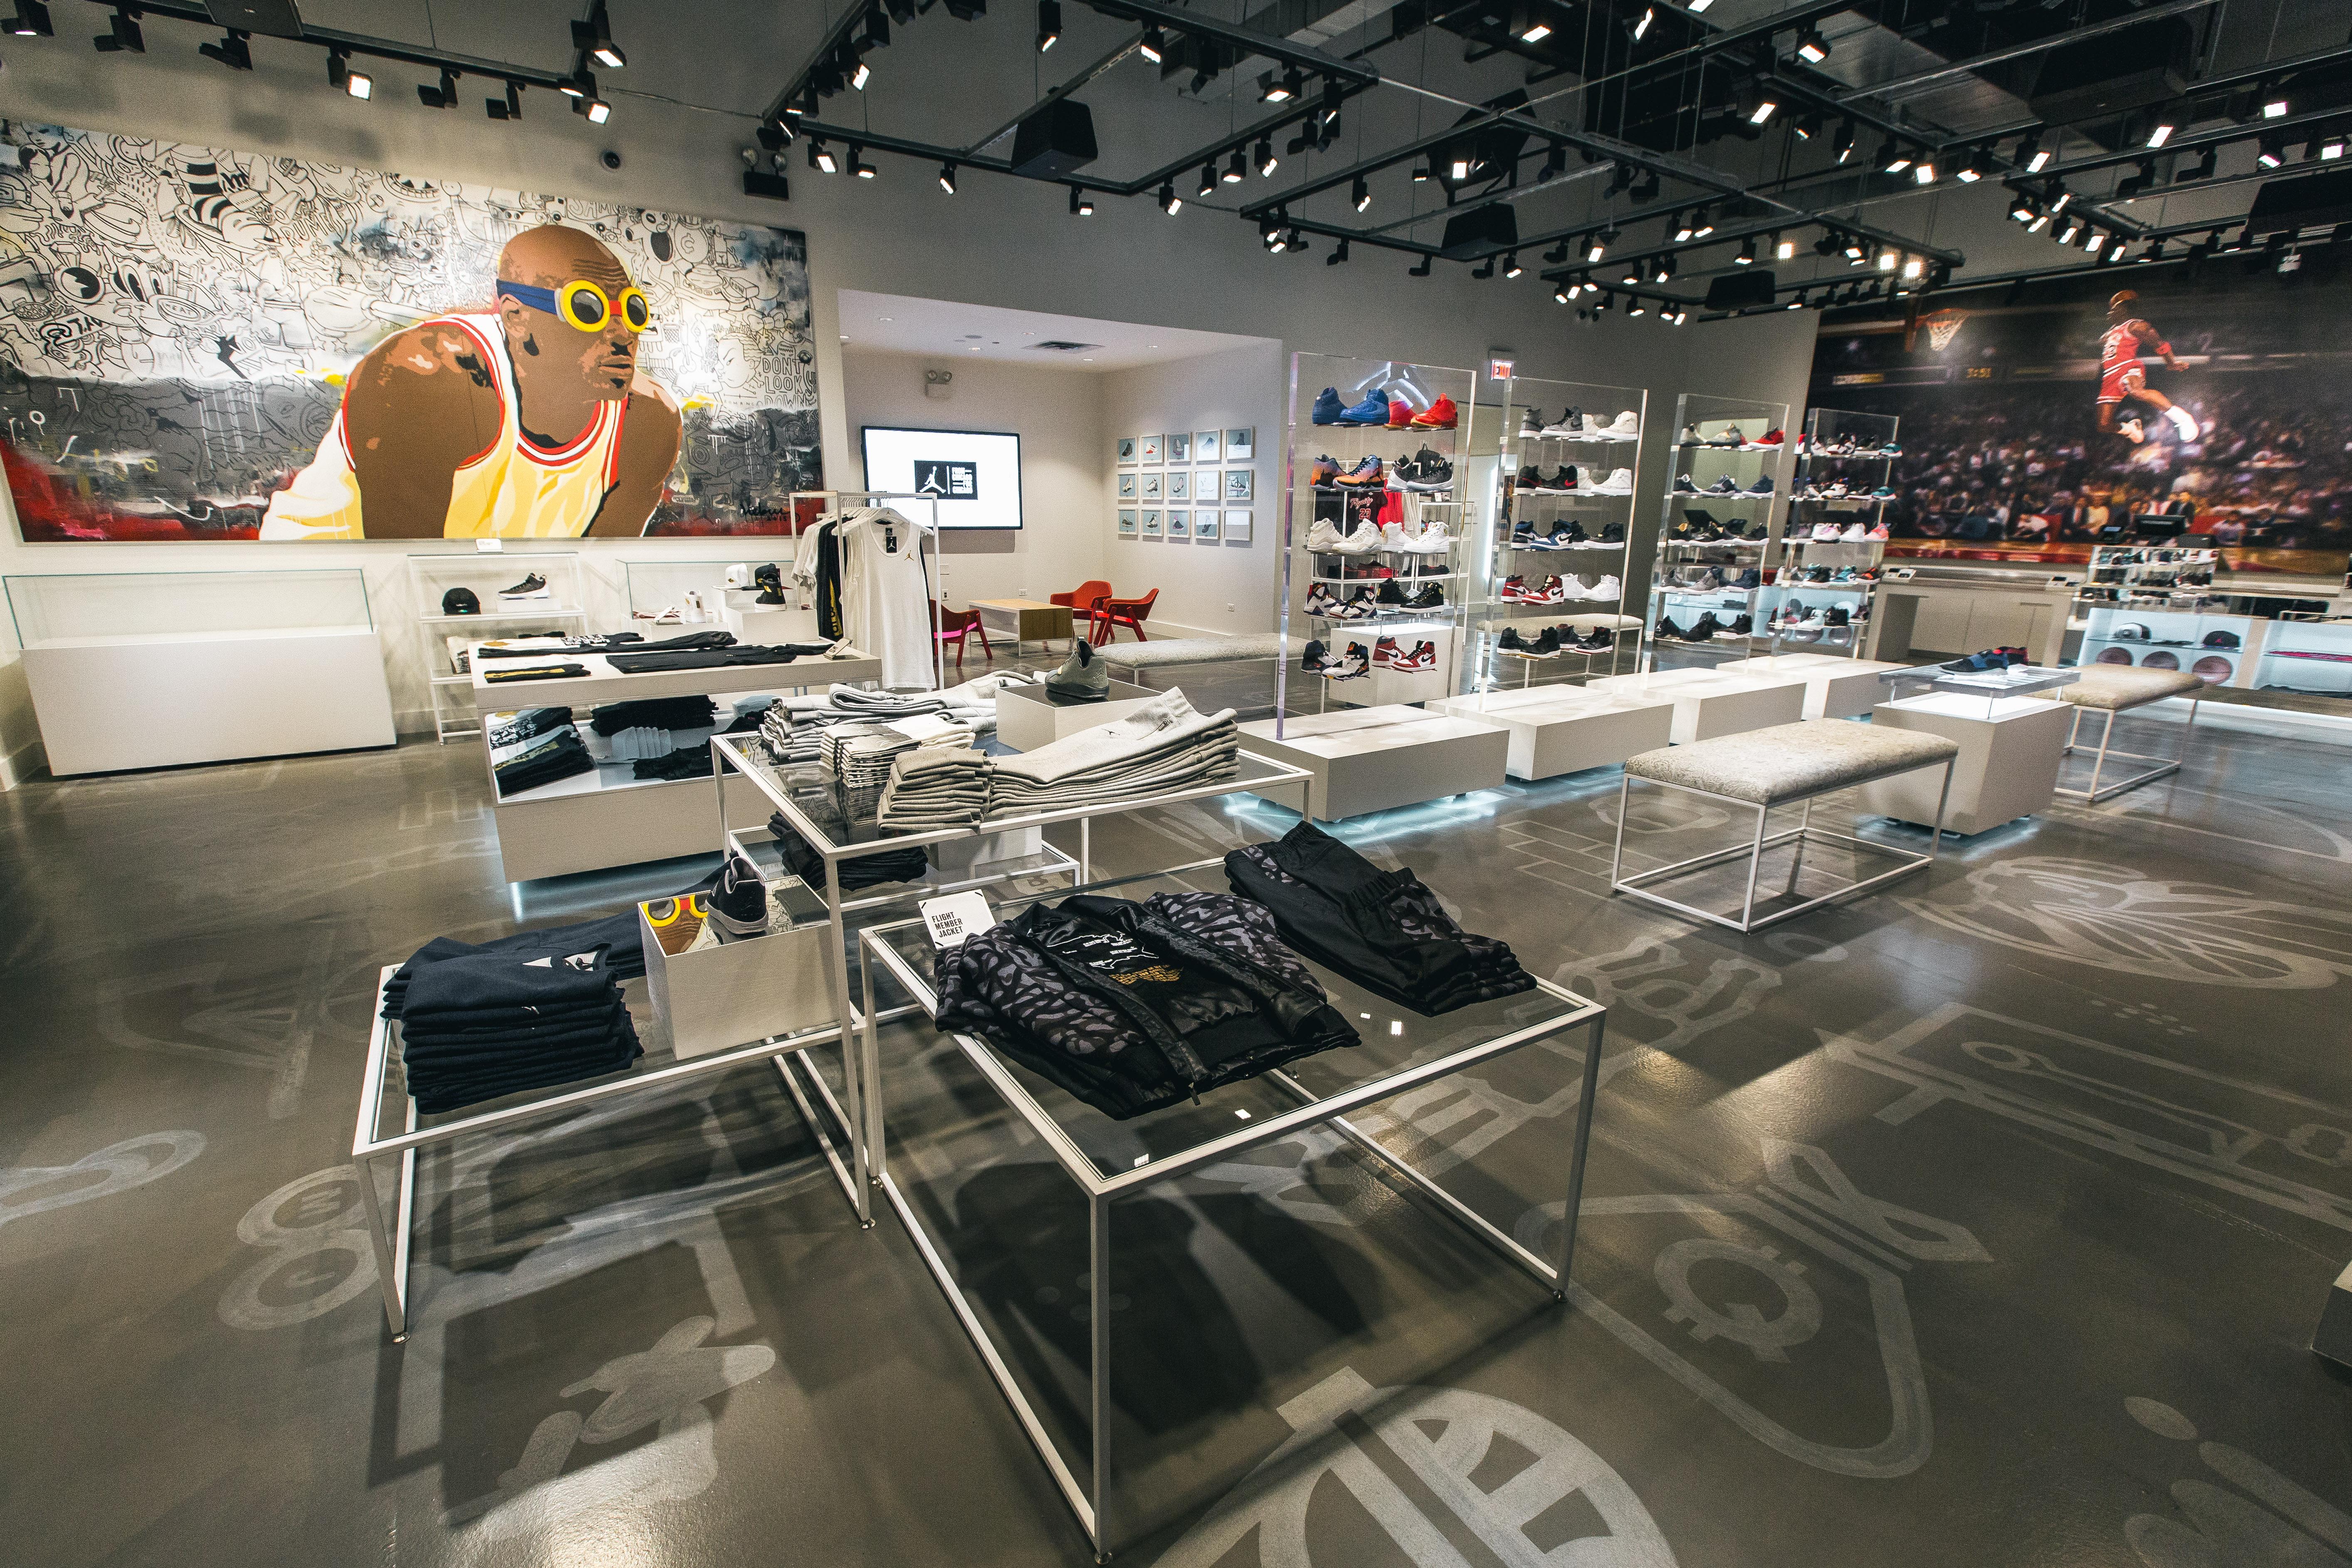 Chicago Shoe Store For Jordans